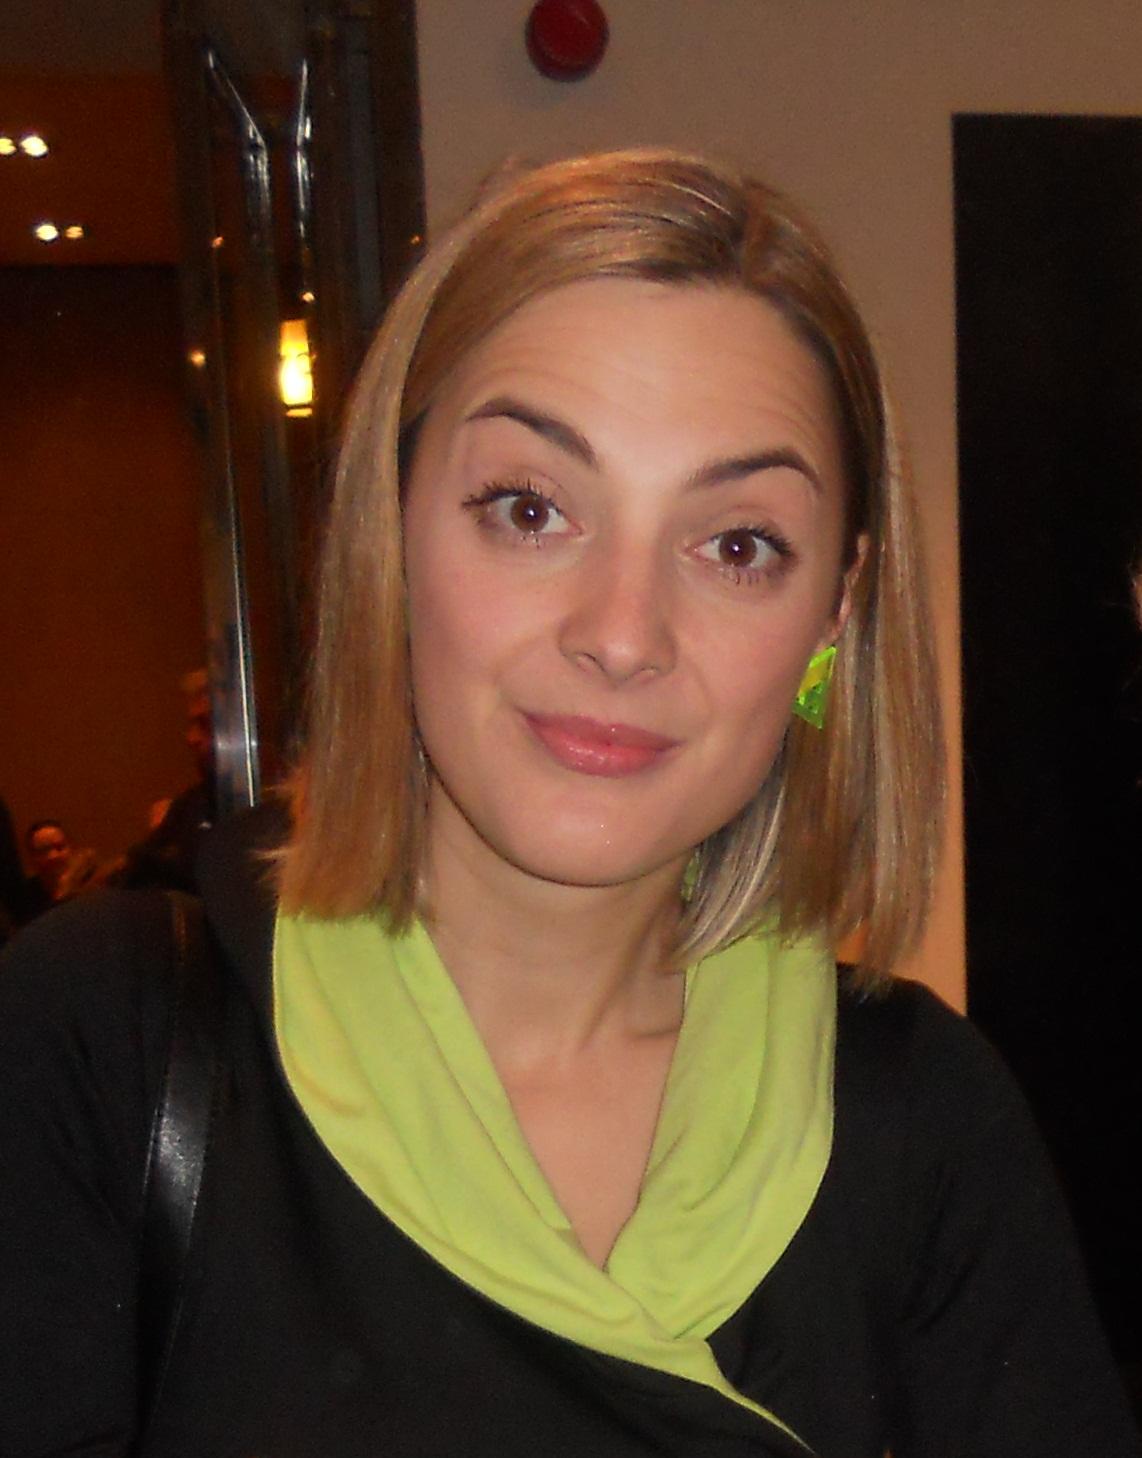 czech porn actress ceske herecky nahe